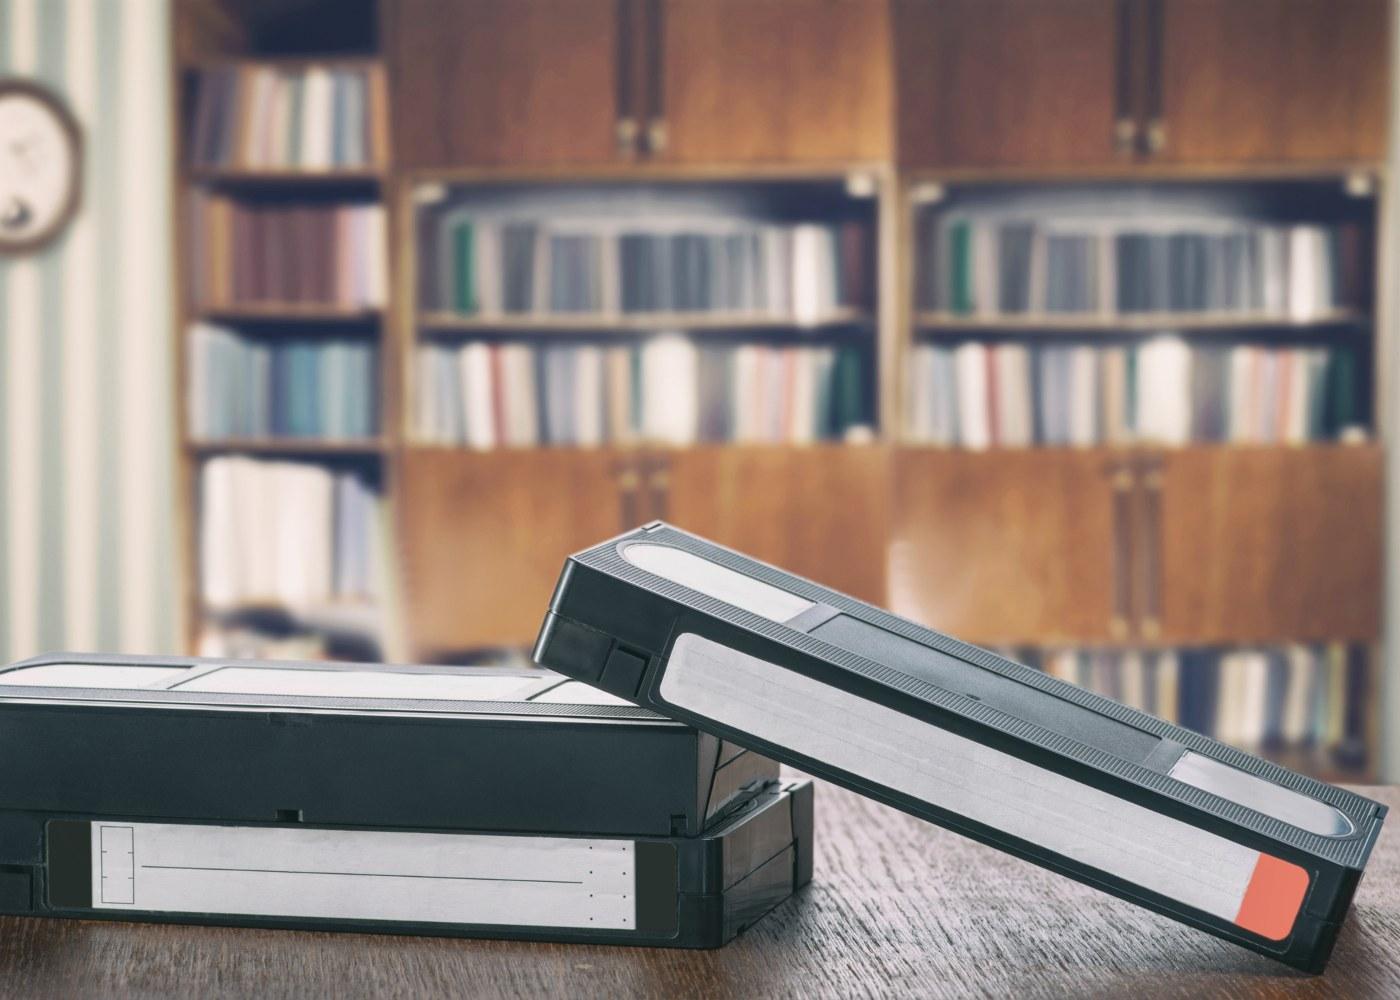 Cassetes antigas de VHS para converter para digital